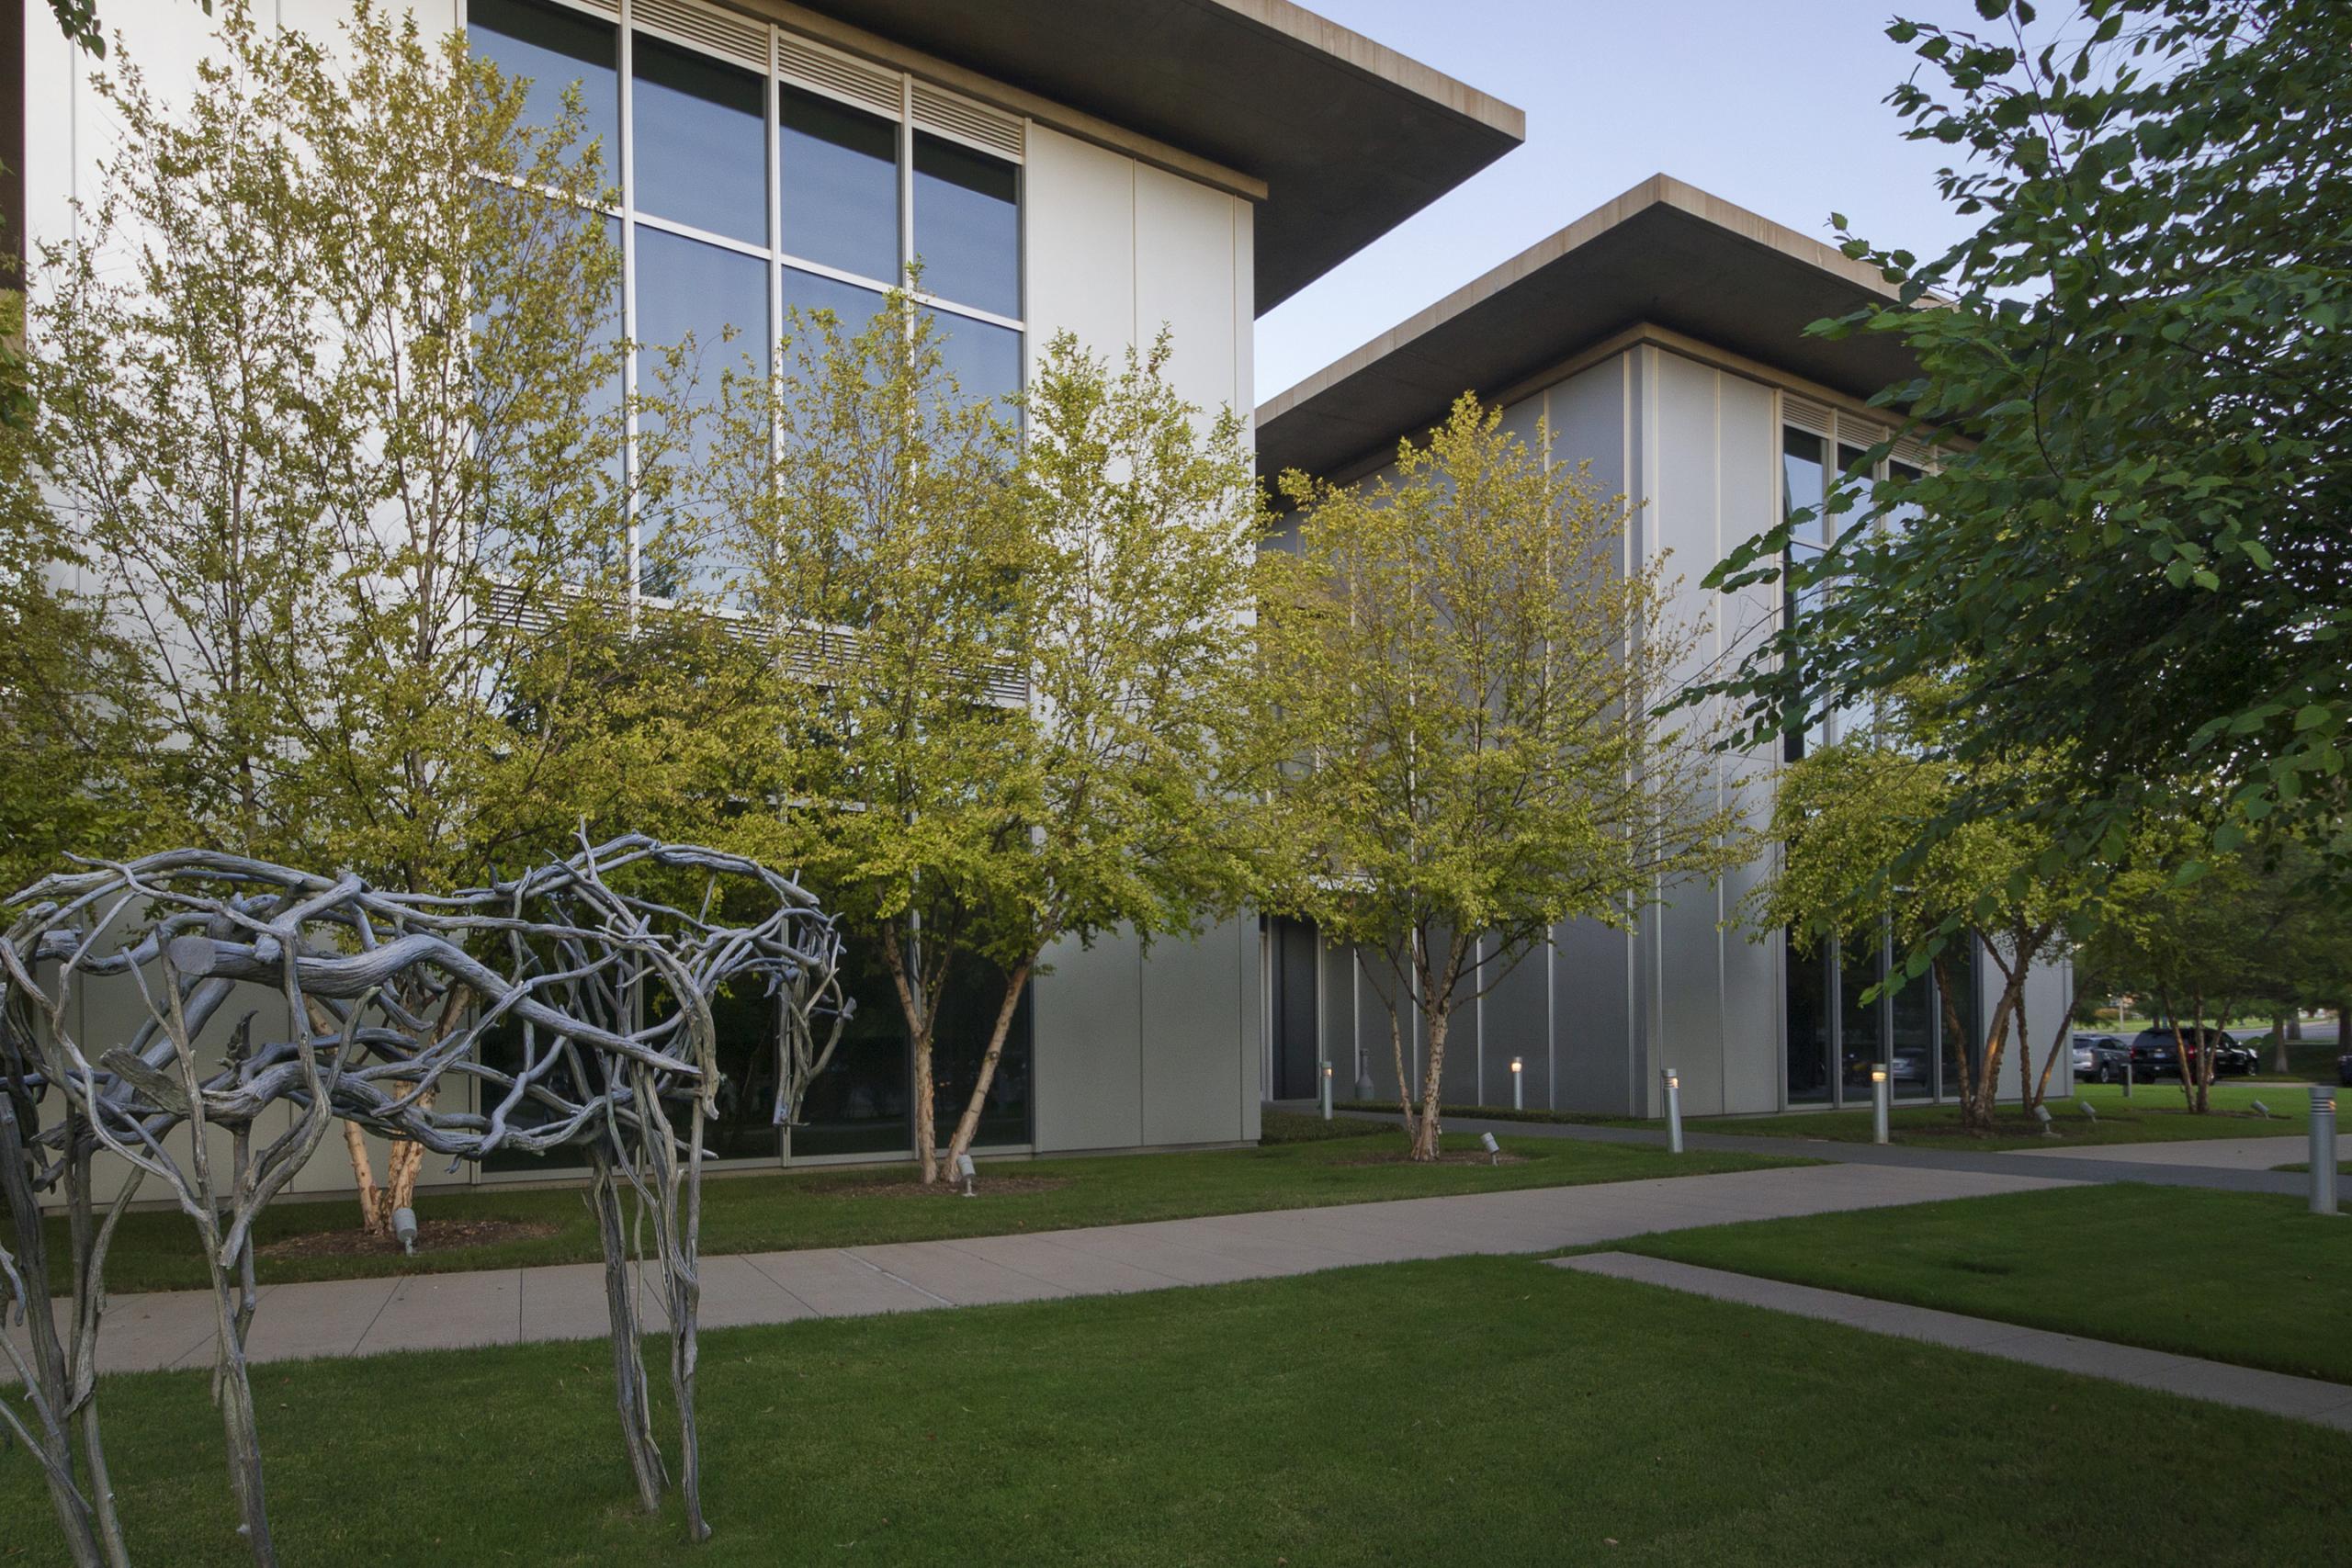 View of the Modern with Deborah Butterfield bronze horse sculpture